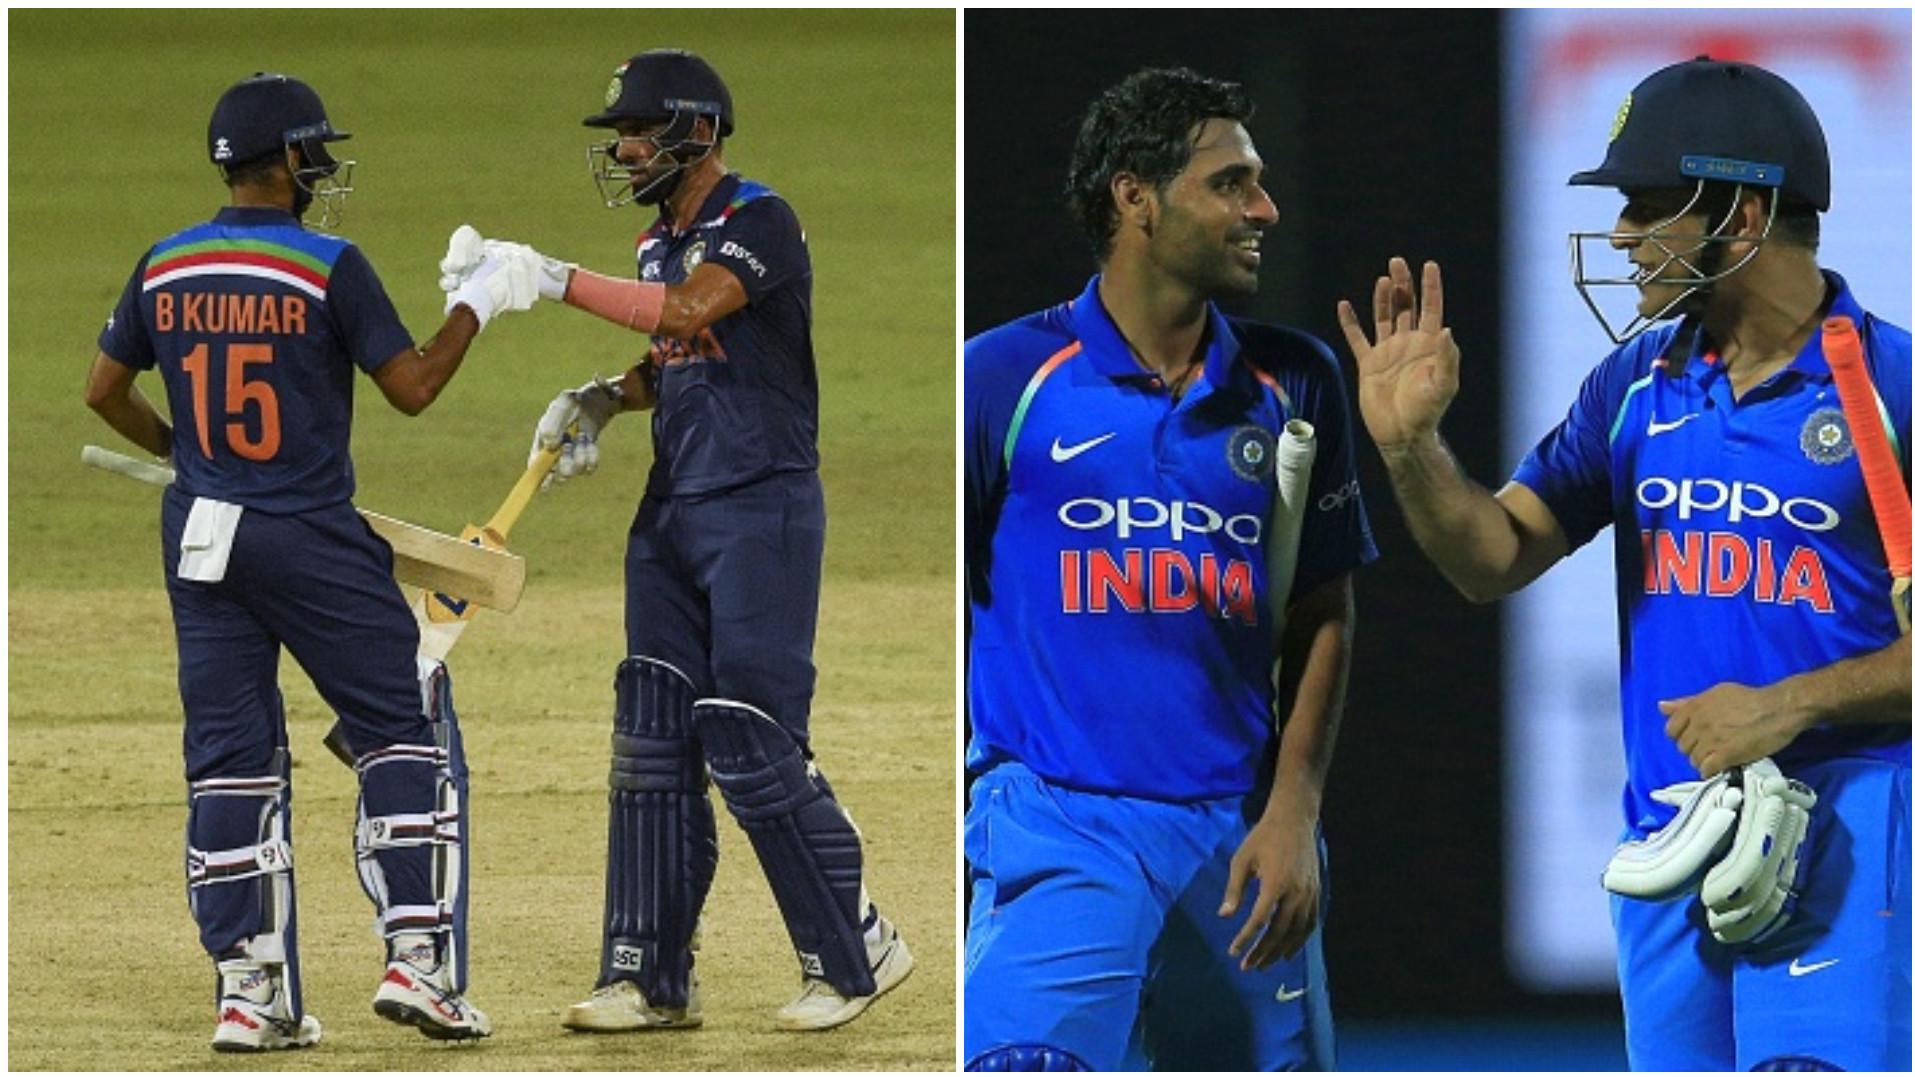 SL v IND 2021: Bhuvneshwar Kumar recalls his heroic 2017 partnership with MS Dhoni after 2nd ODI win